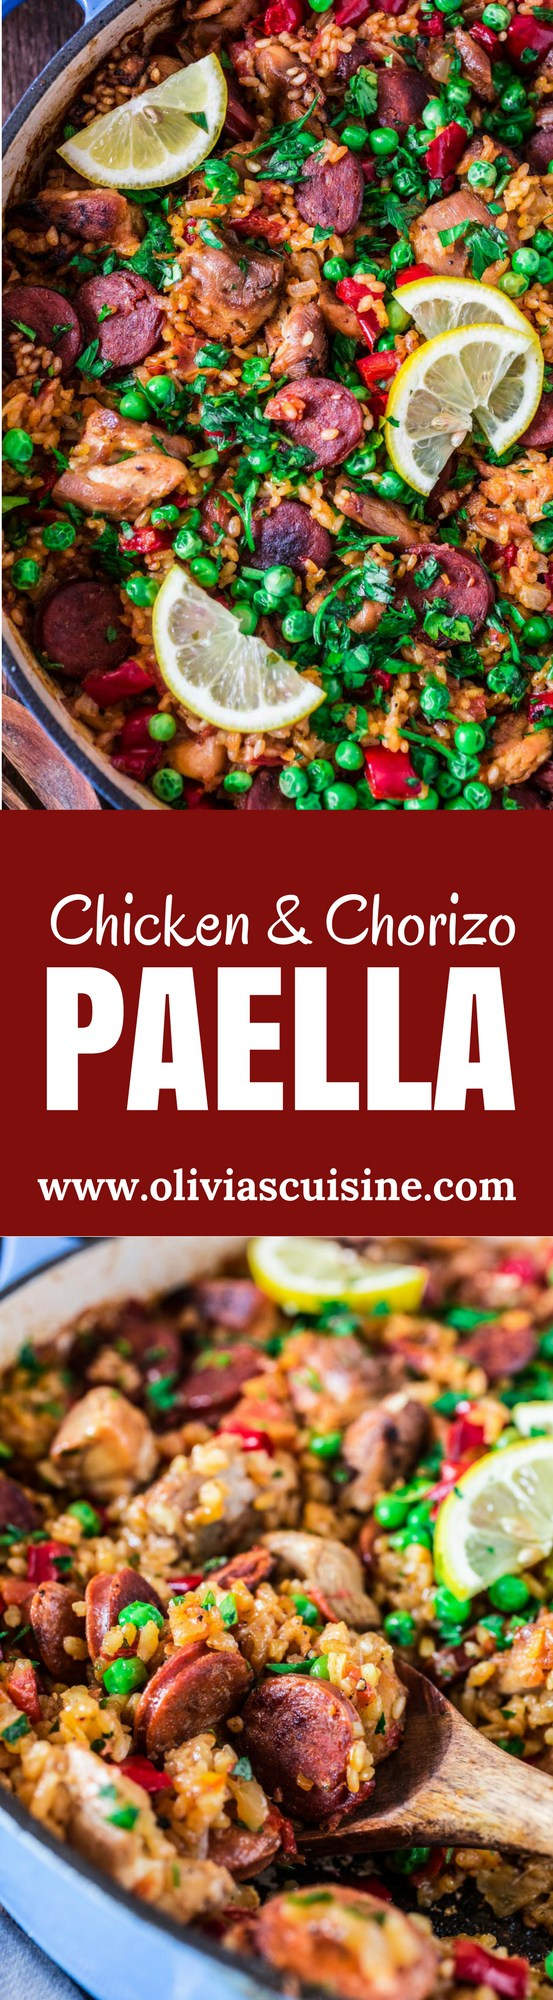 Chicken And Chorizo Paella Www Oliviascuisine Com A Chicken And Chorizo Paella Might Sound Like A Very Ambitiou Paella Recipe Recipes International Recipes